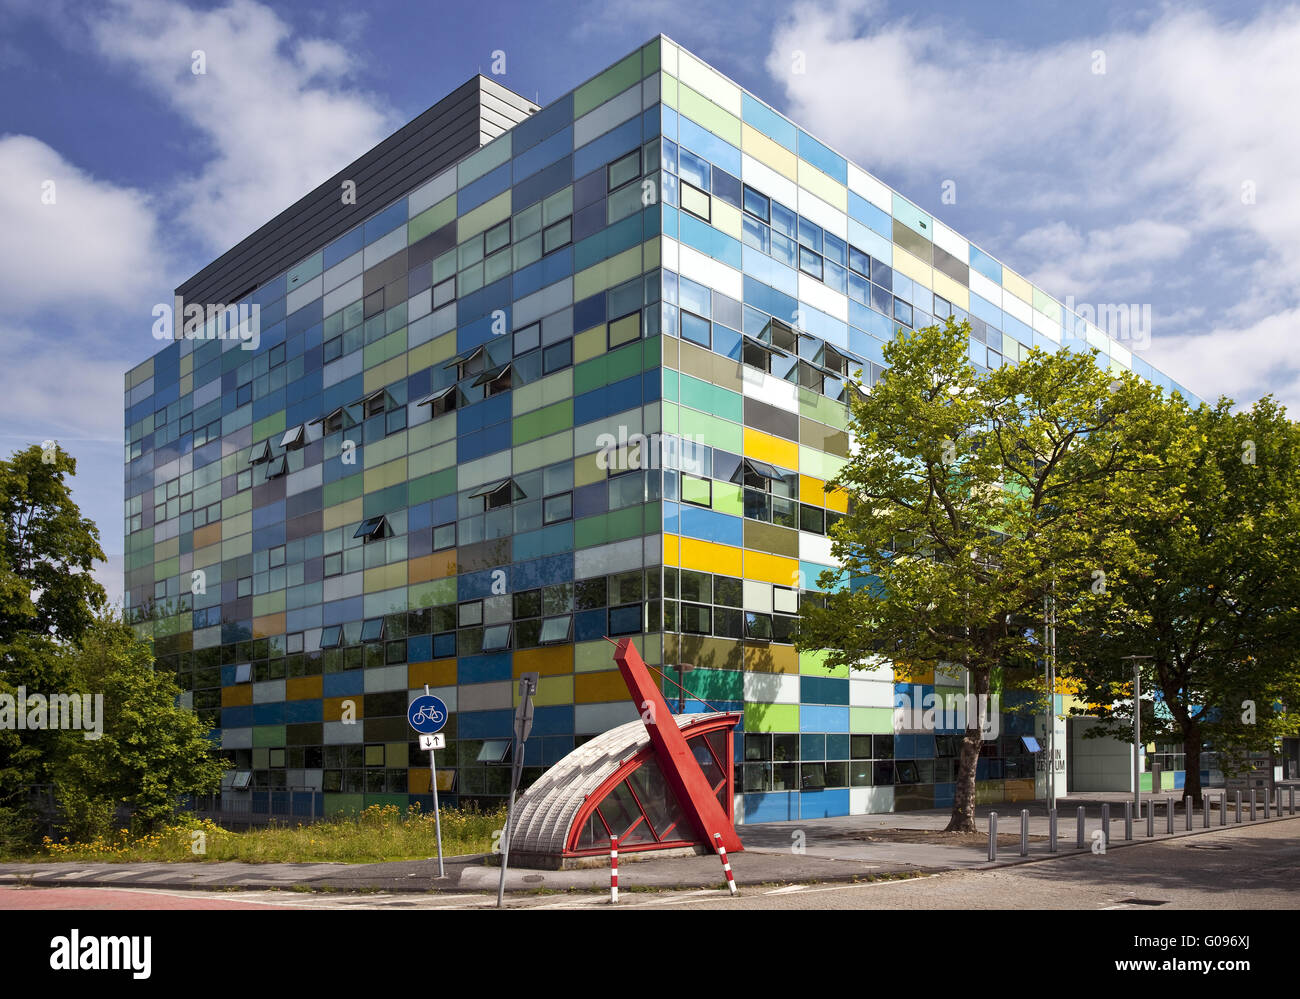 The Bio Medical Center in Bochum in Germany. - Stock Image